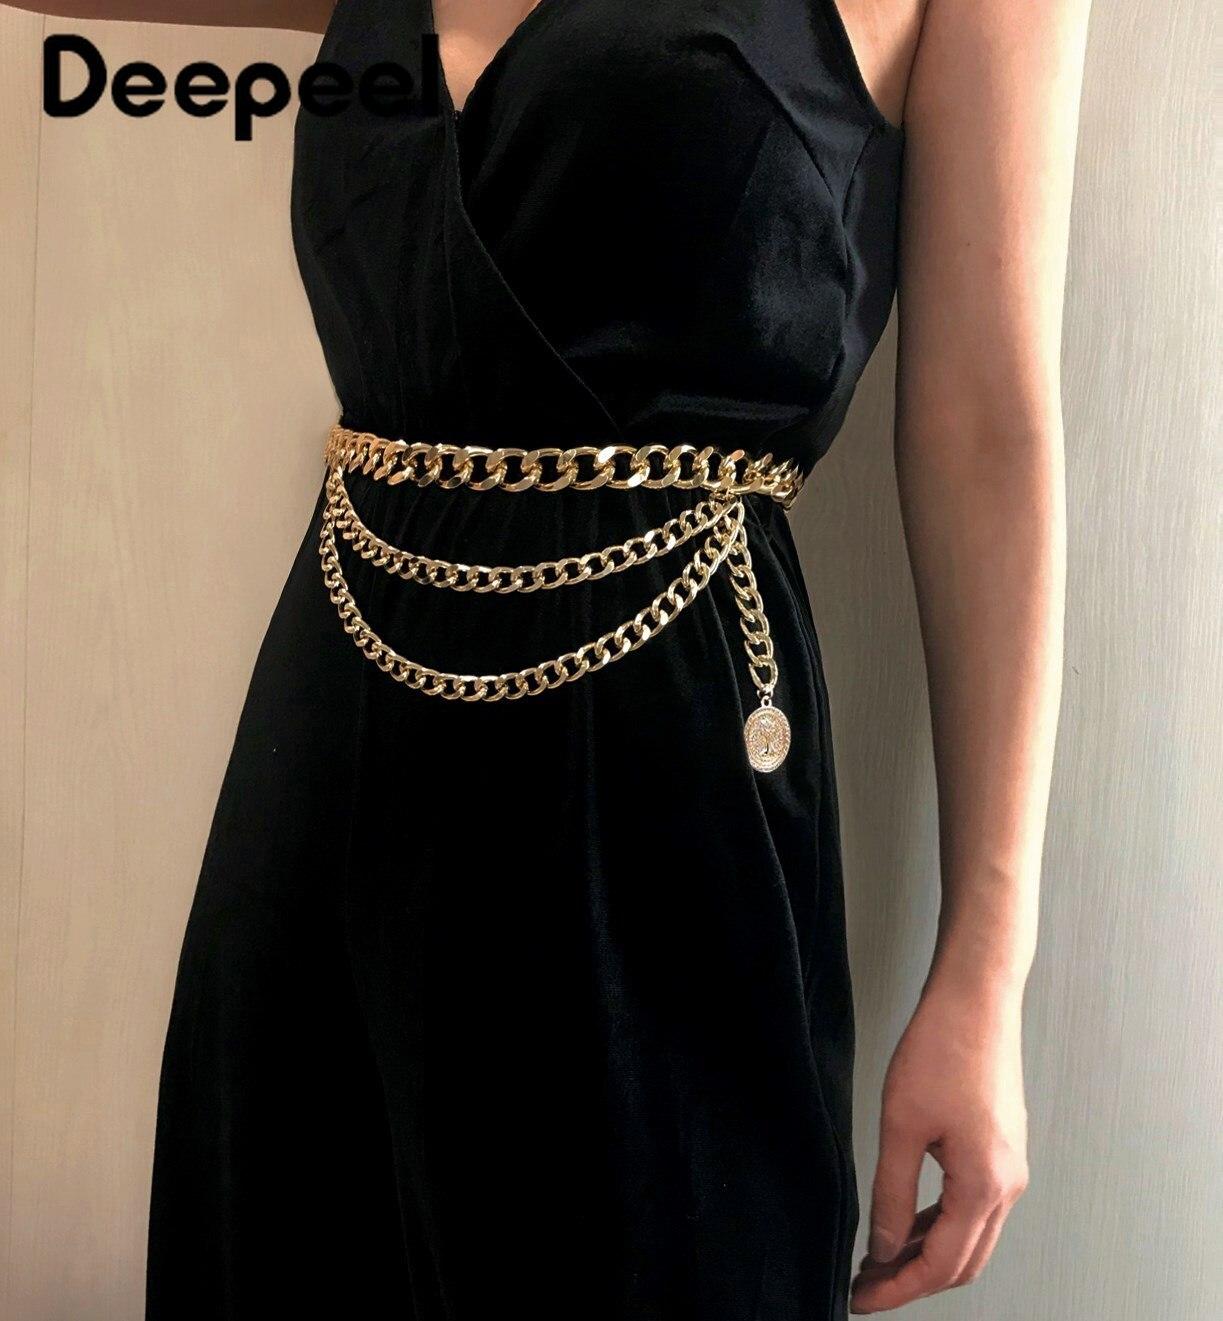 Deepeel 1pc 93cm  Fashion Corset For Women Metal Decorative Cummerbunds Vintage Fringed ChainSexy Wind Cummerbunds YK711